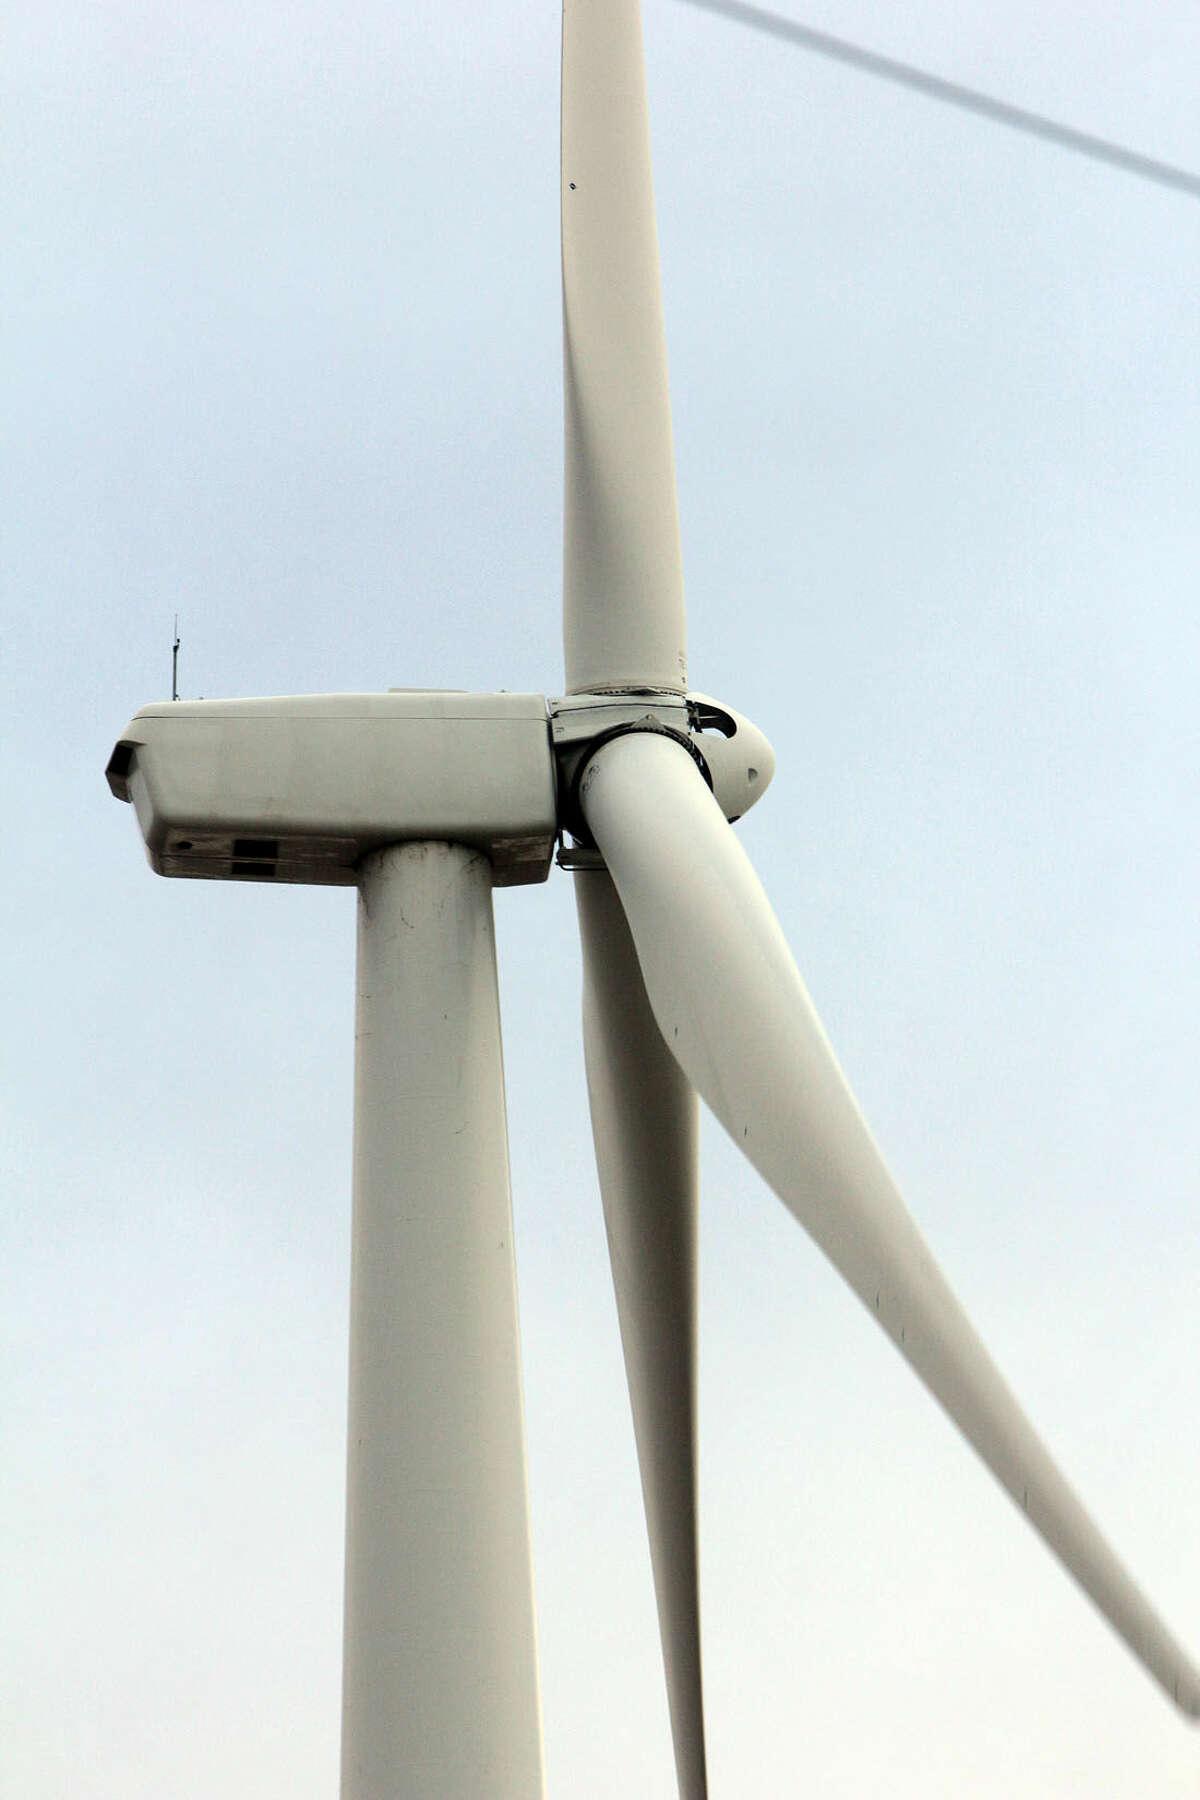 A nearby turbine without oil markings. Photo taken Feb. 29. (Chris Aldridge/Huron Daily Tribune)